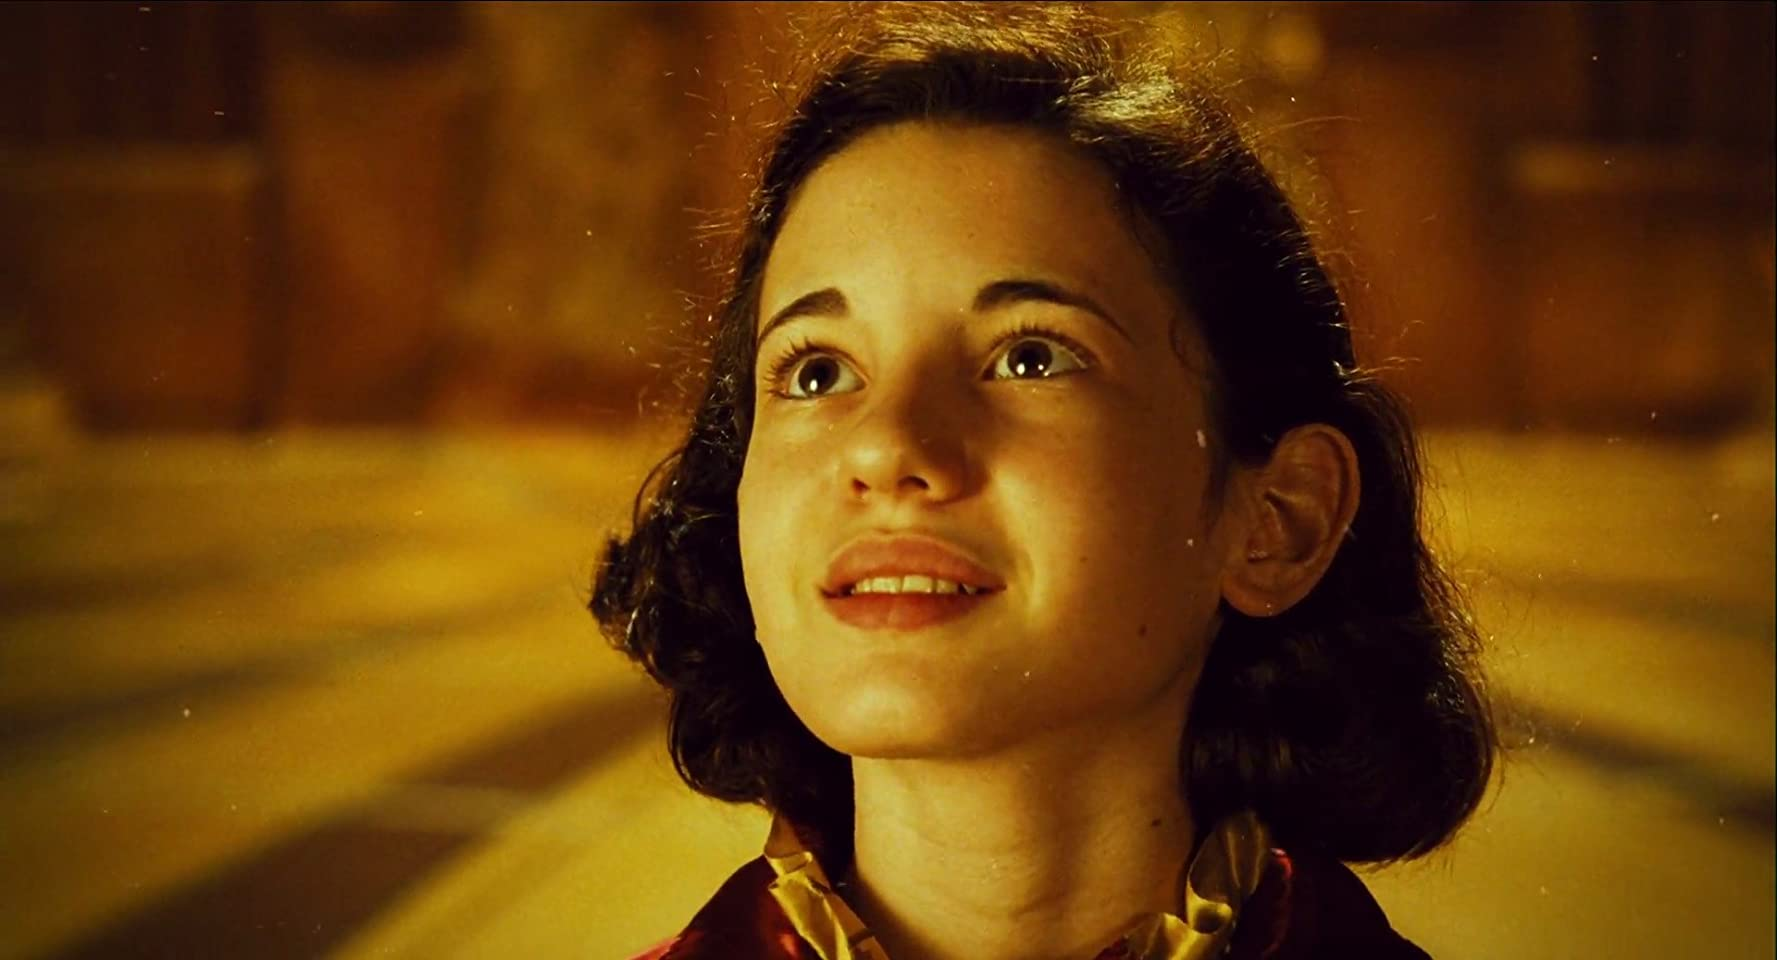 Ivana Baquero in El laberinto del fauno (2006)